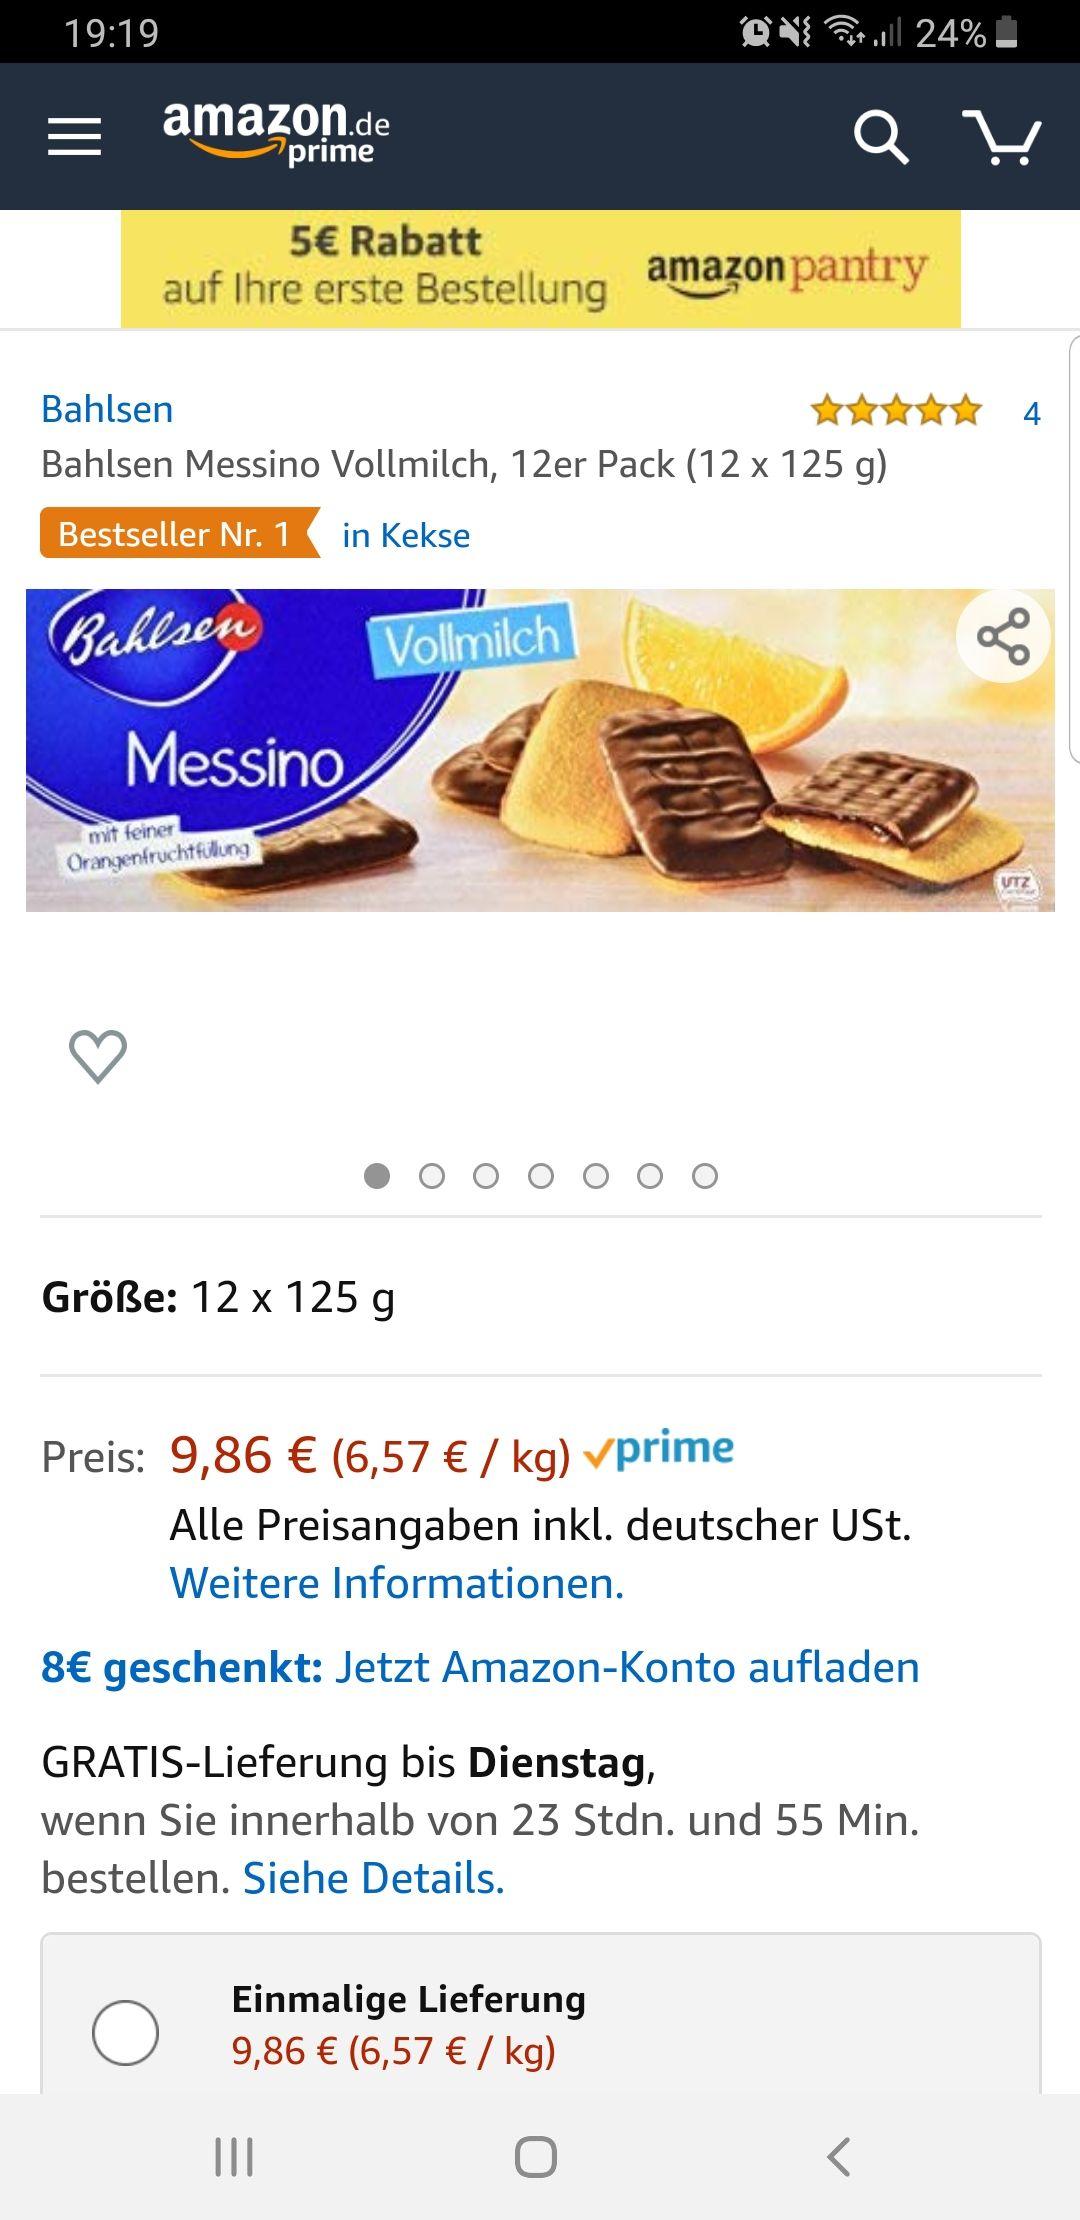 Bahlsen MessinomitVollmilchim12er Pack